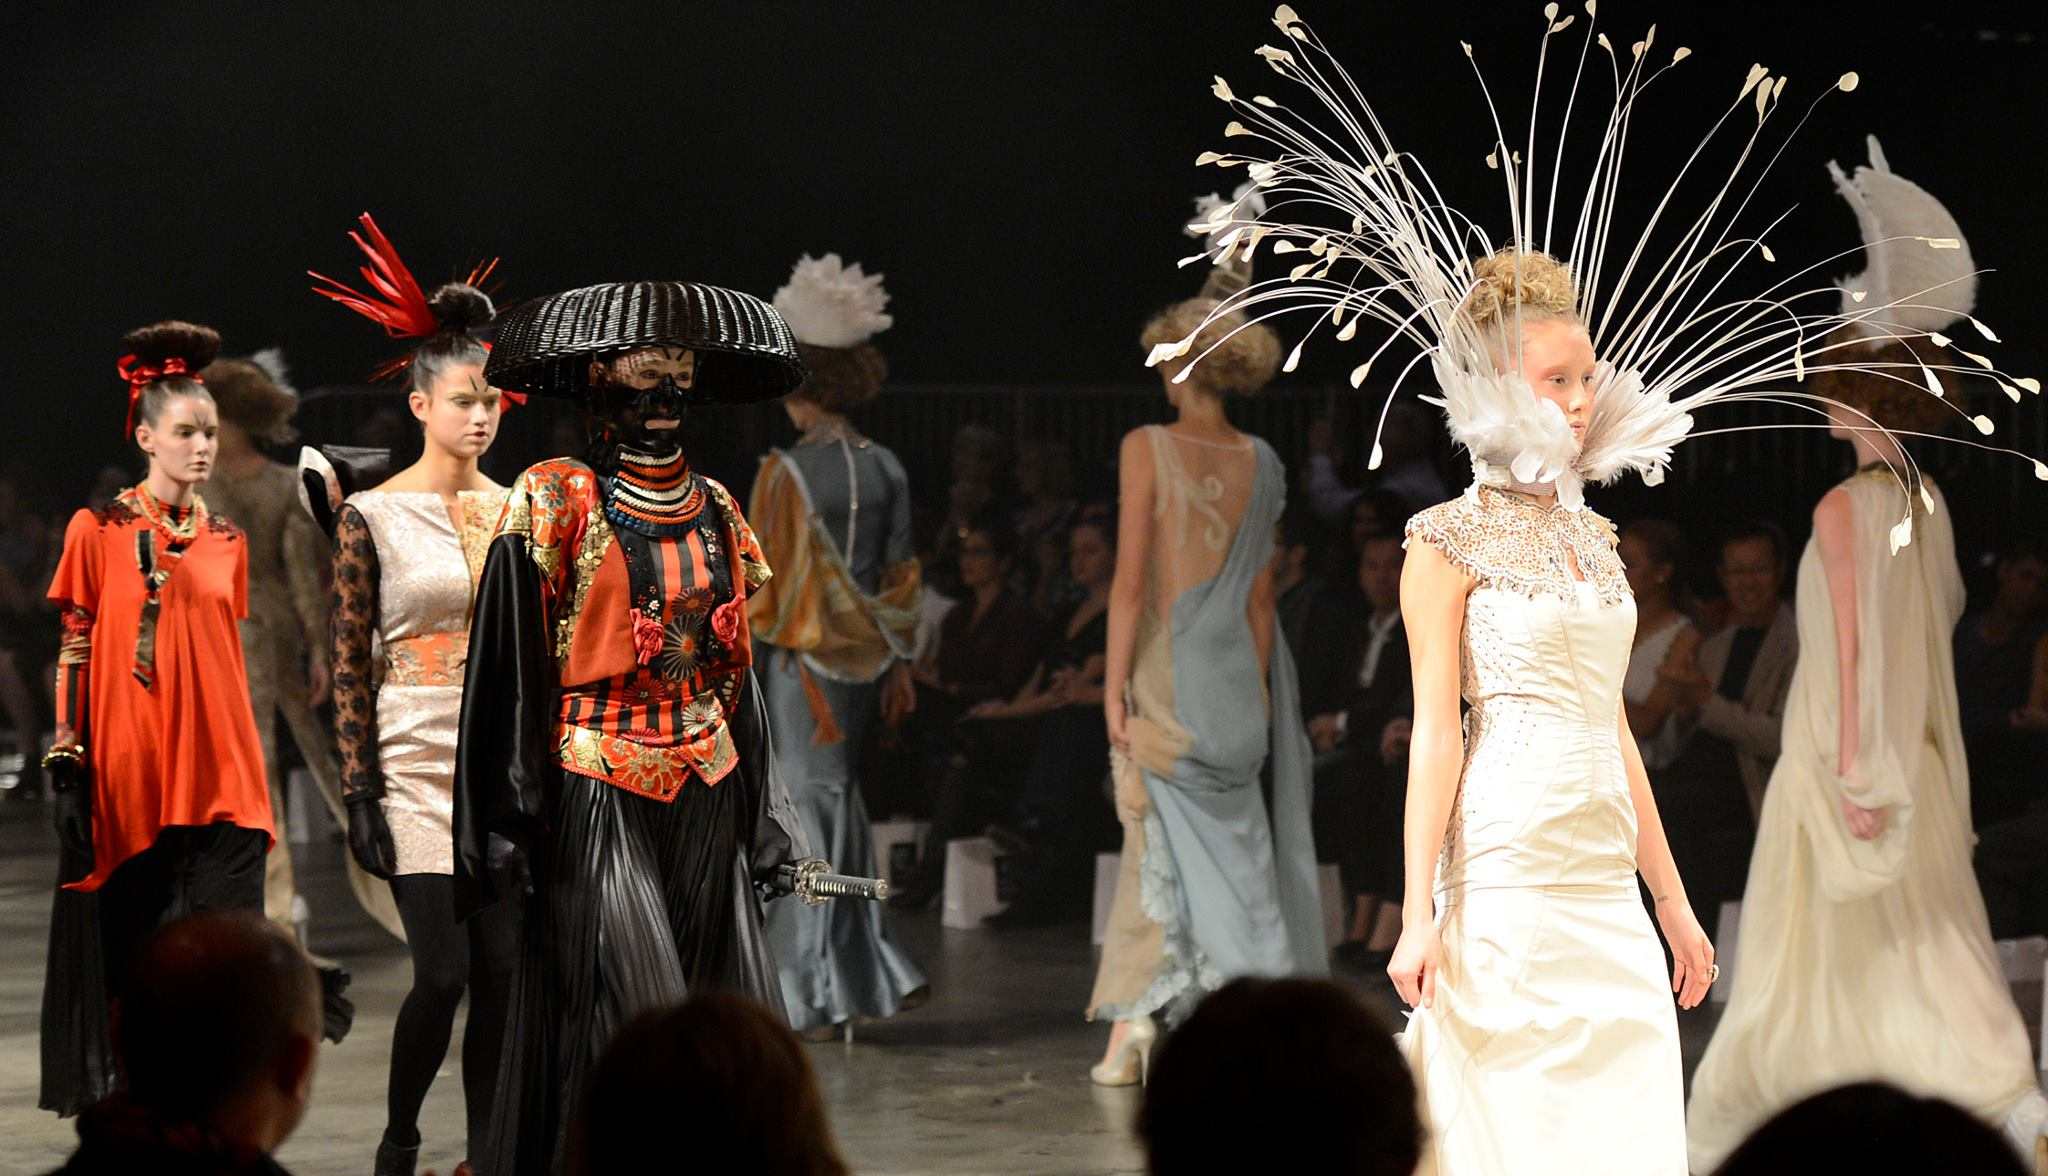 Melinda Looi at Perth Fashion Week 2012